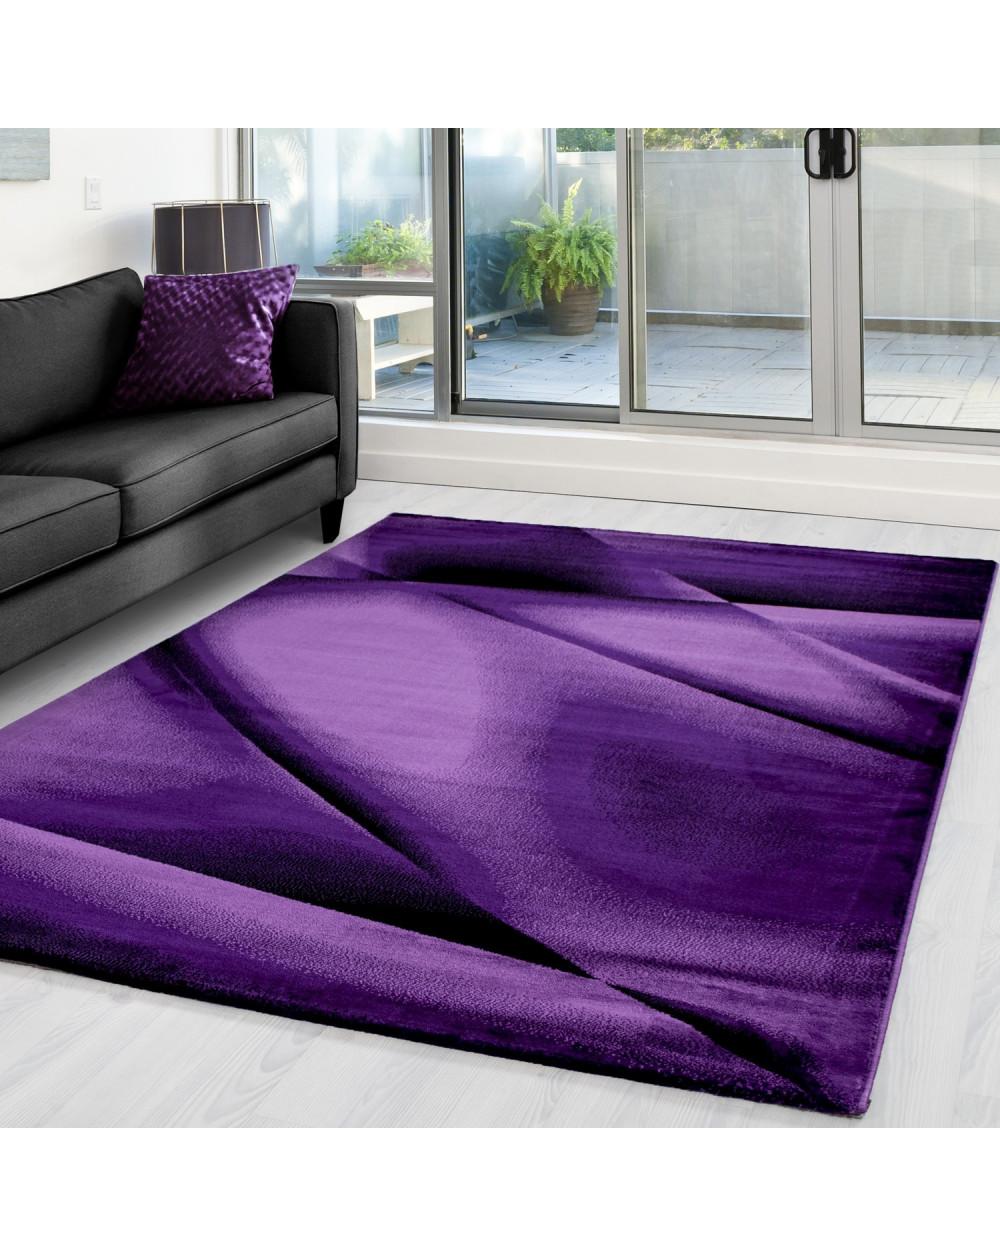 Moderner Designer Teppich MIAMI 6590 LILA